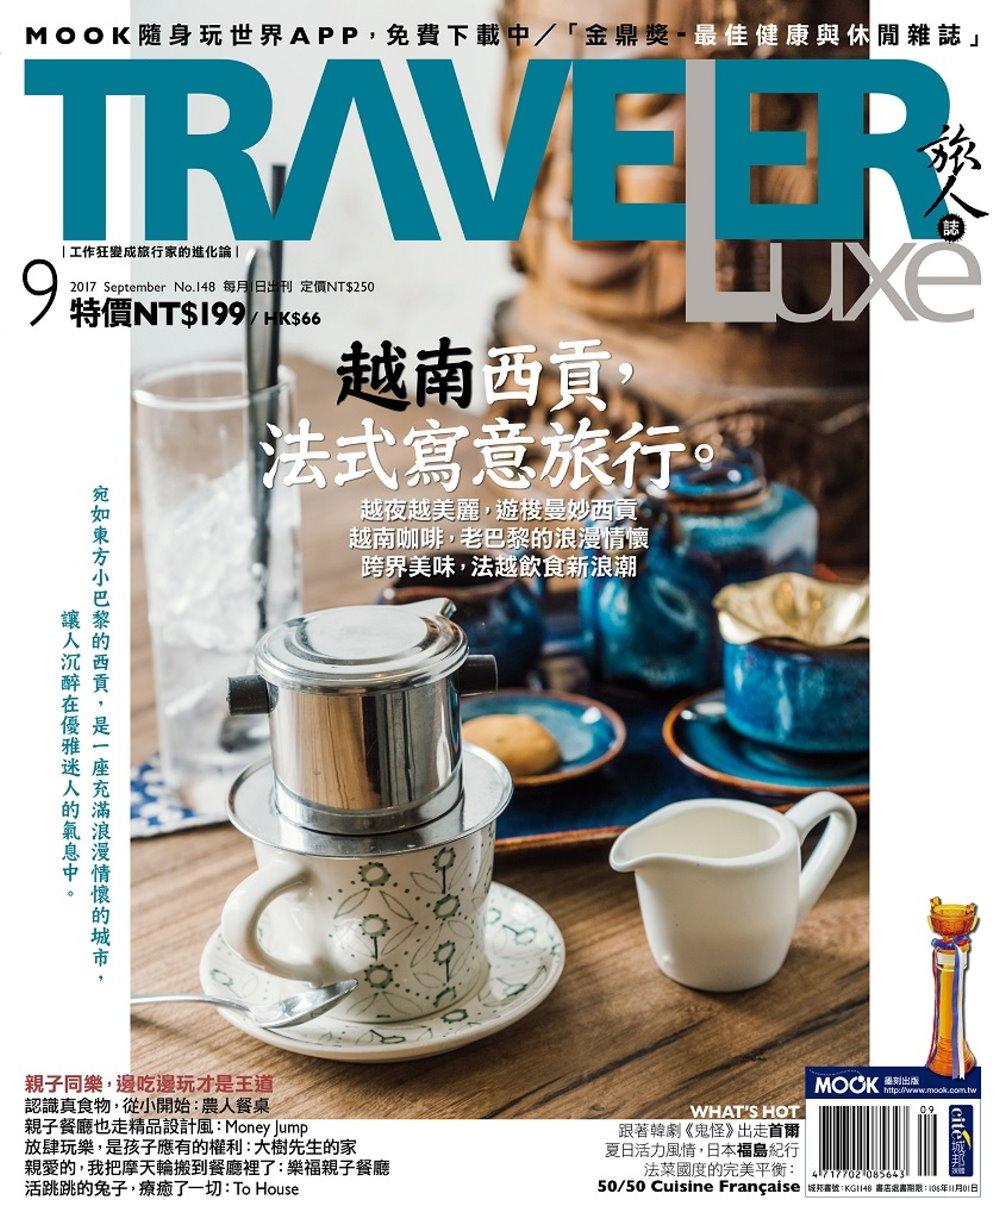 TRAVELER LUXE 旅人誌 9月號/2017 第148期